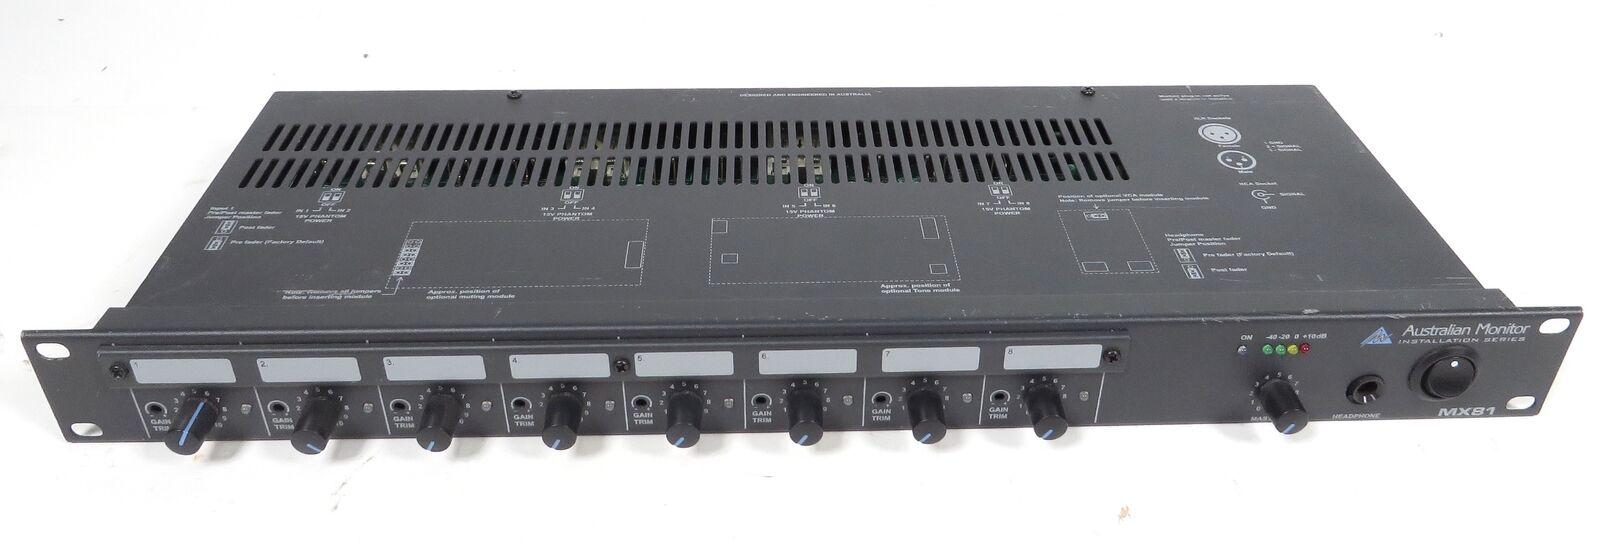 AS-IS Australian Monitor Mixer MX81